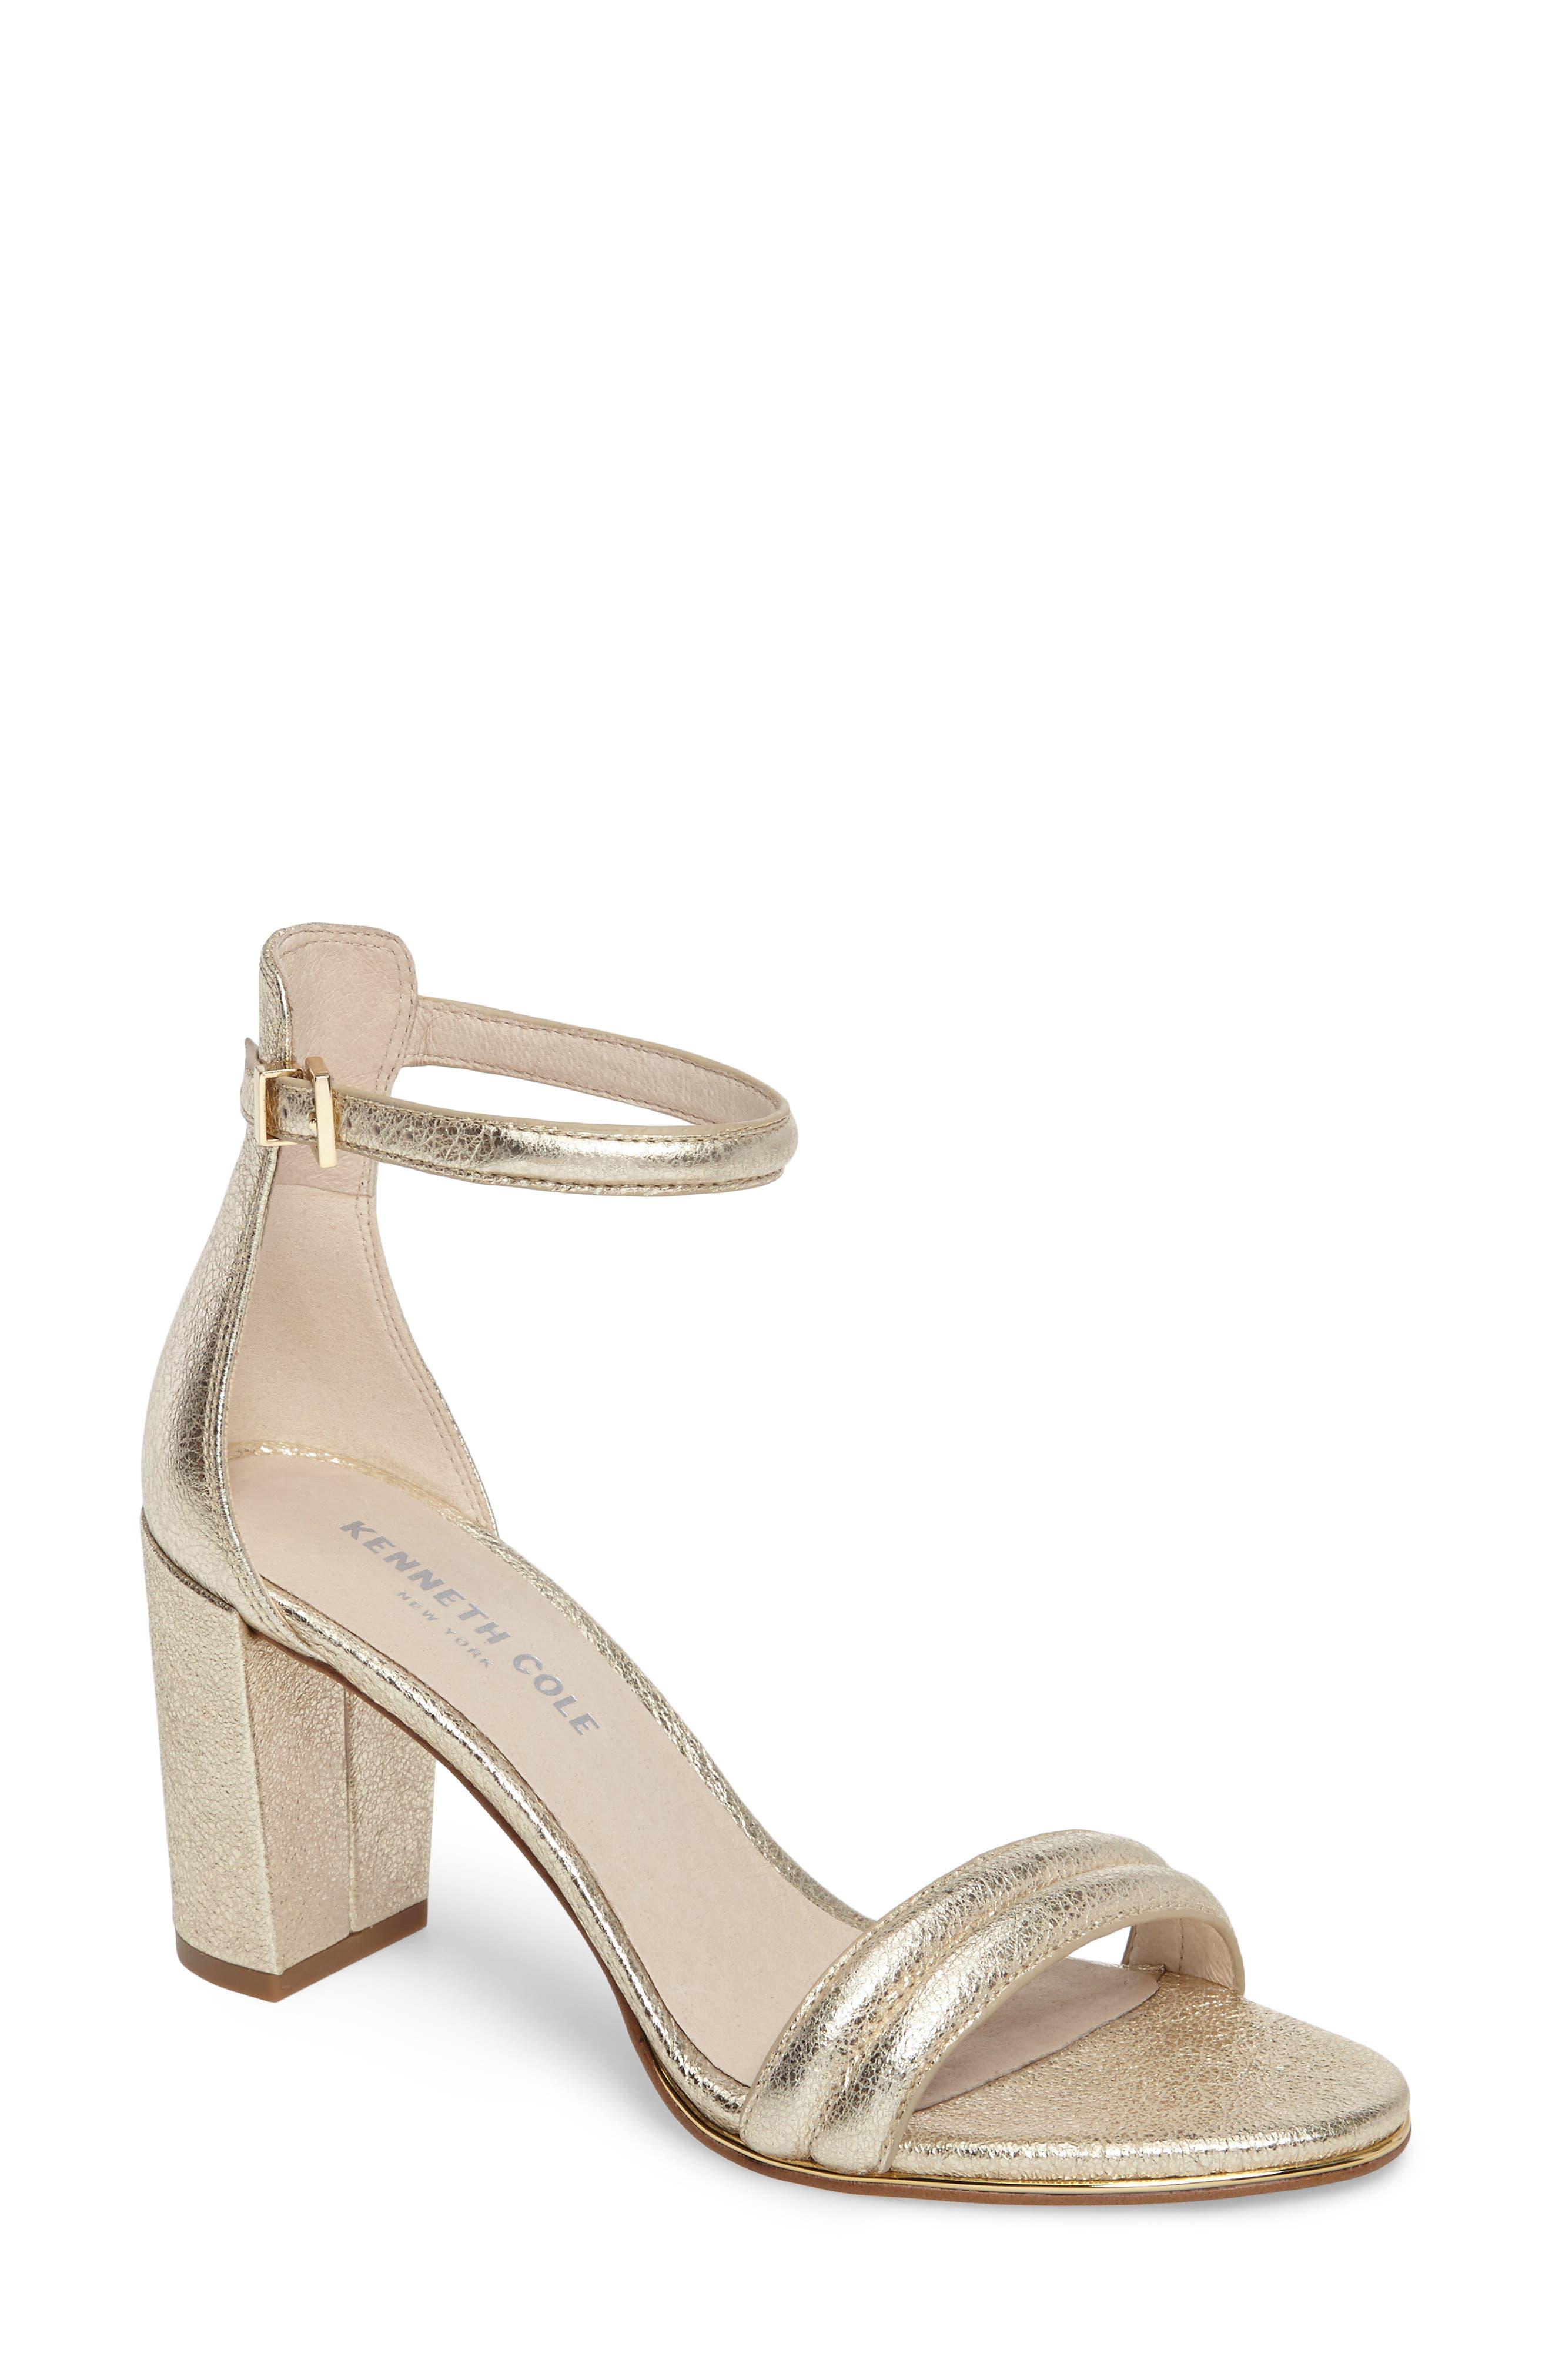 Alternate Image 1 Selected - Kenneth Cole New York 'Lex' Ankle Strap Sandal (Women)